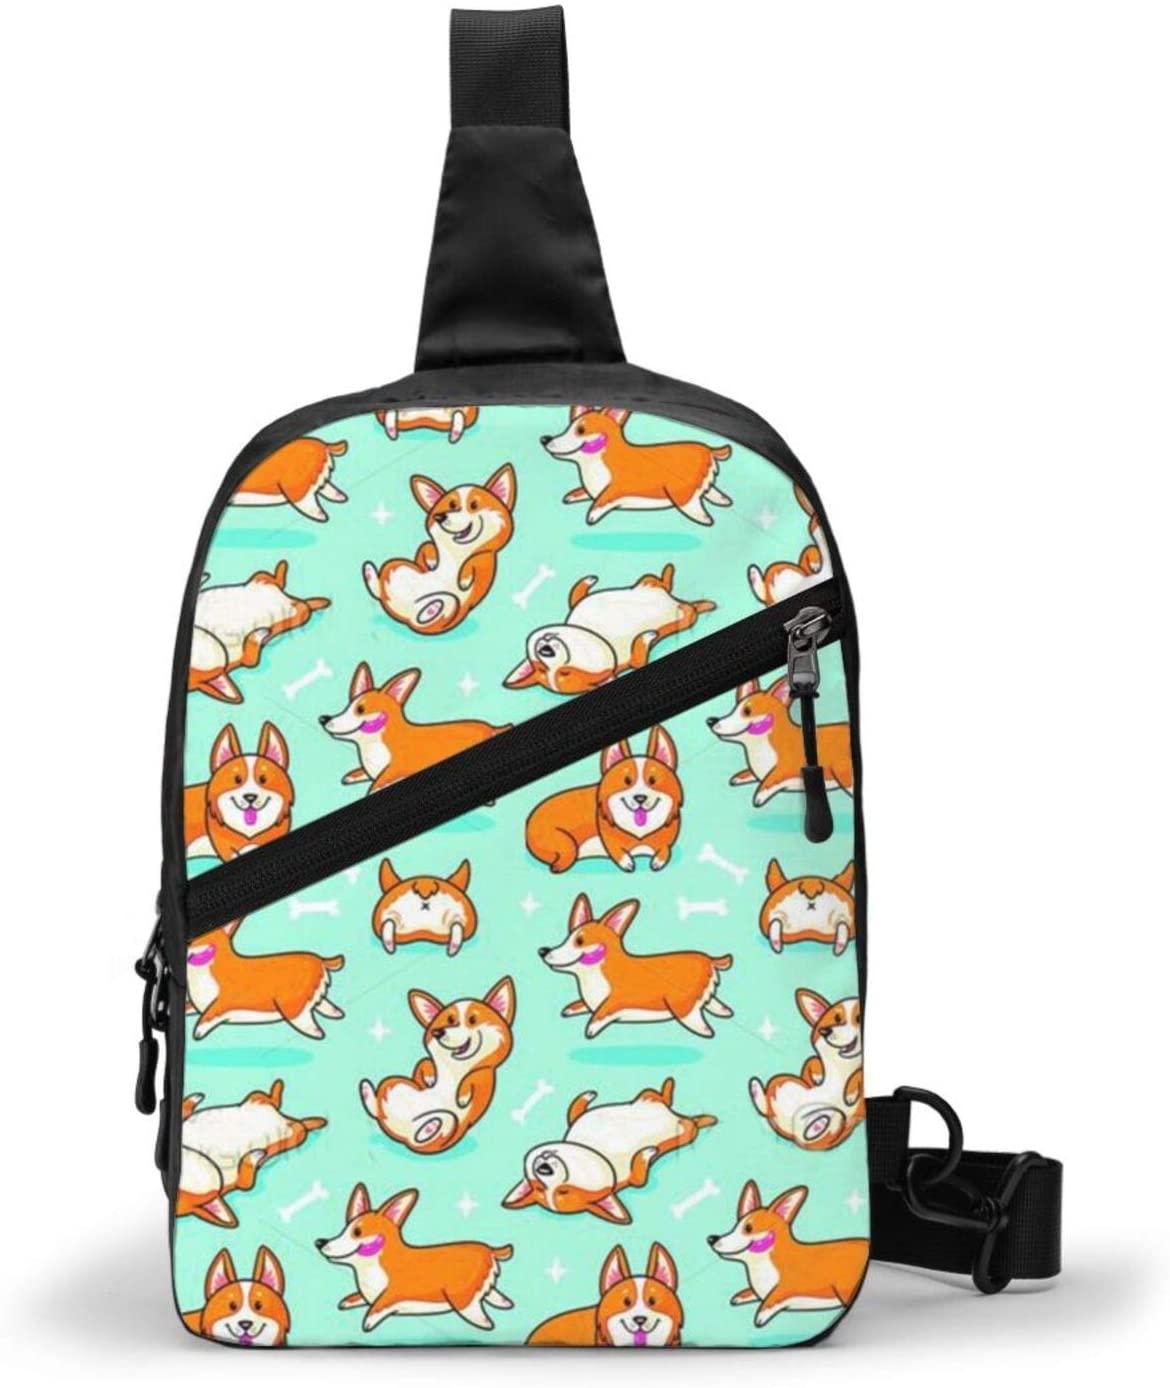 Neddelo Corgi Crossbody Bag,Portable Chest Bags,Folding Chest Bag, Men's and Women Sling Bag for Travel,Hiking, Cycling,Camping